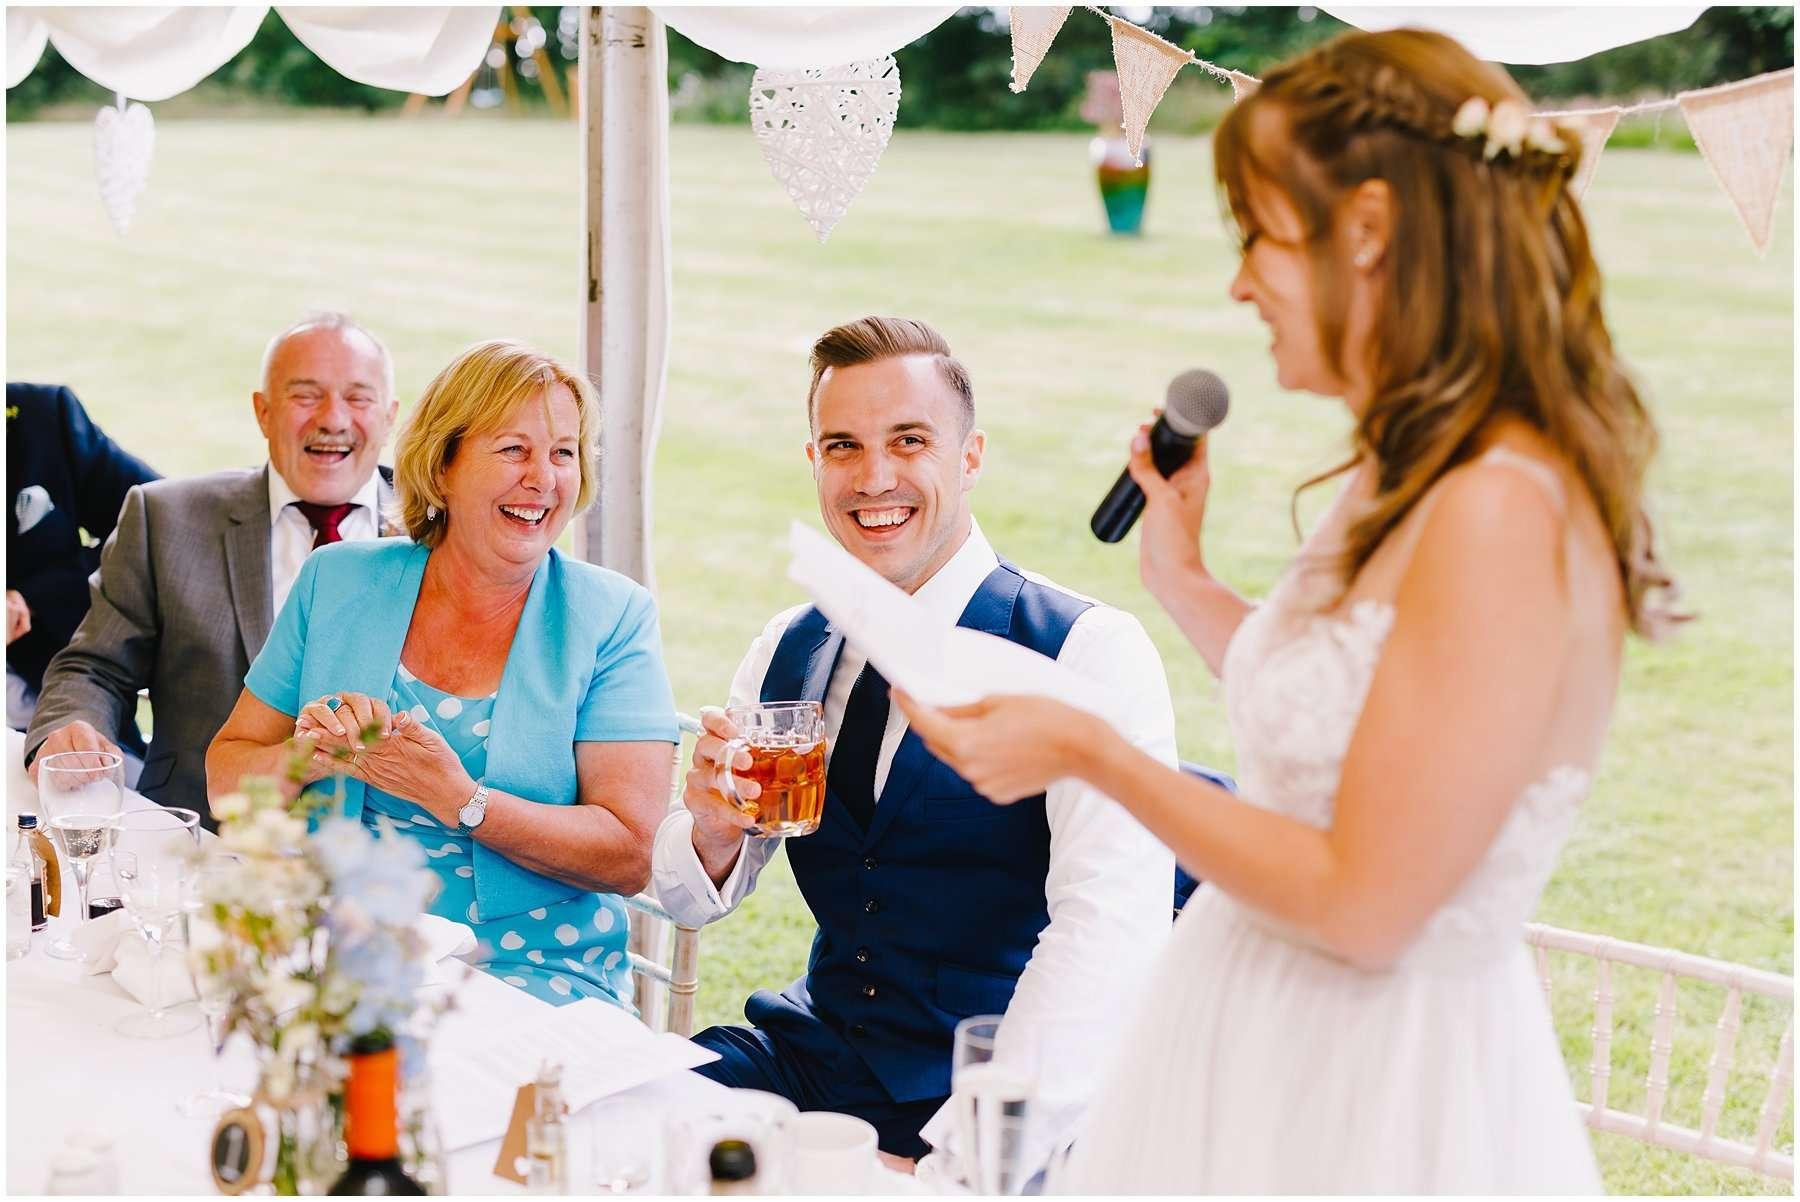 ANDY DAVISON - CHAUCER BARN WEDDING PHOTOGRAPHER